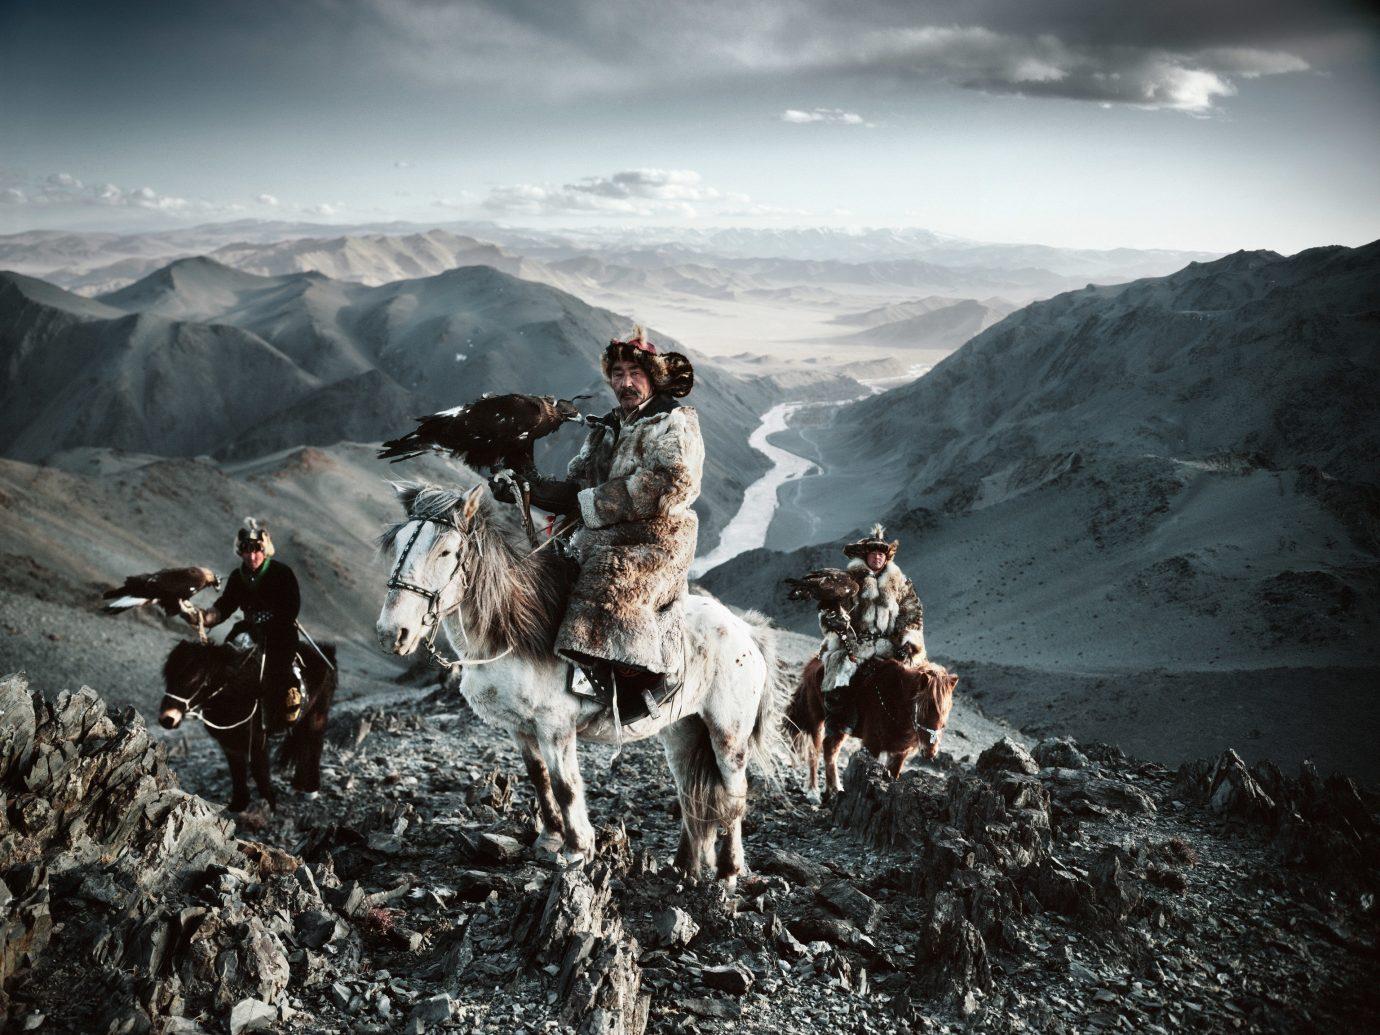 Arts + Culture sky mountain outdoor snow mountainous landforms geological phenomenon standing group people mountain range mammal